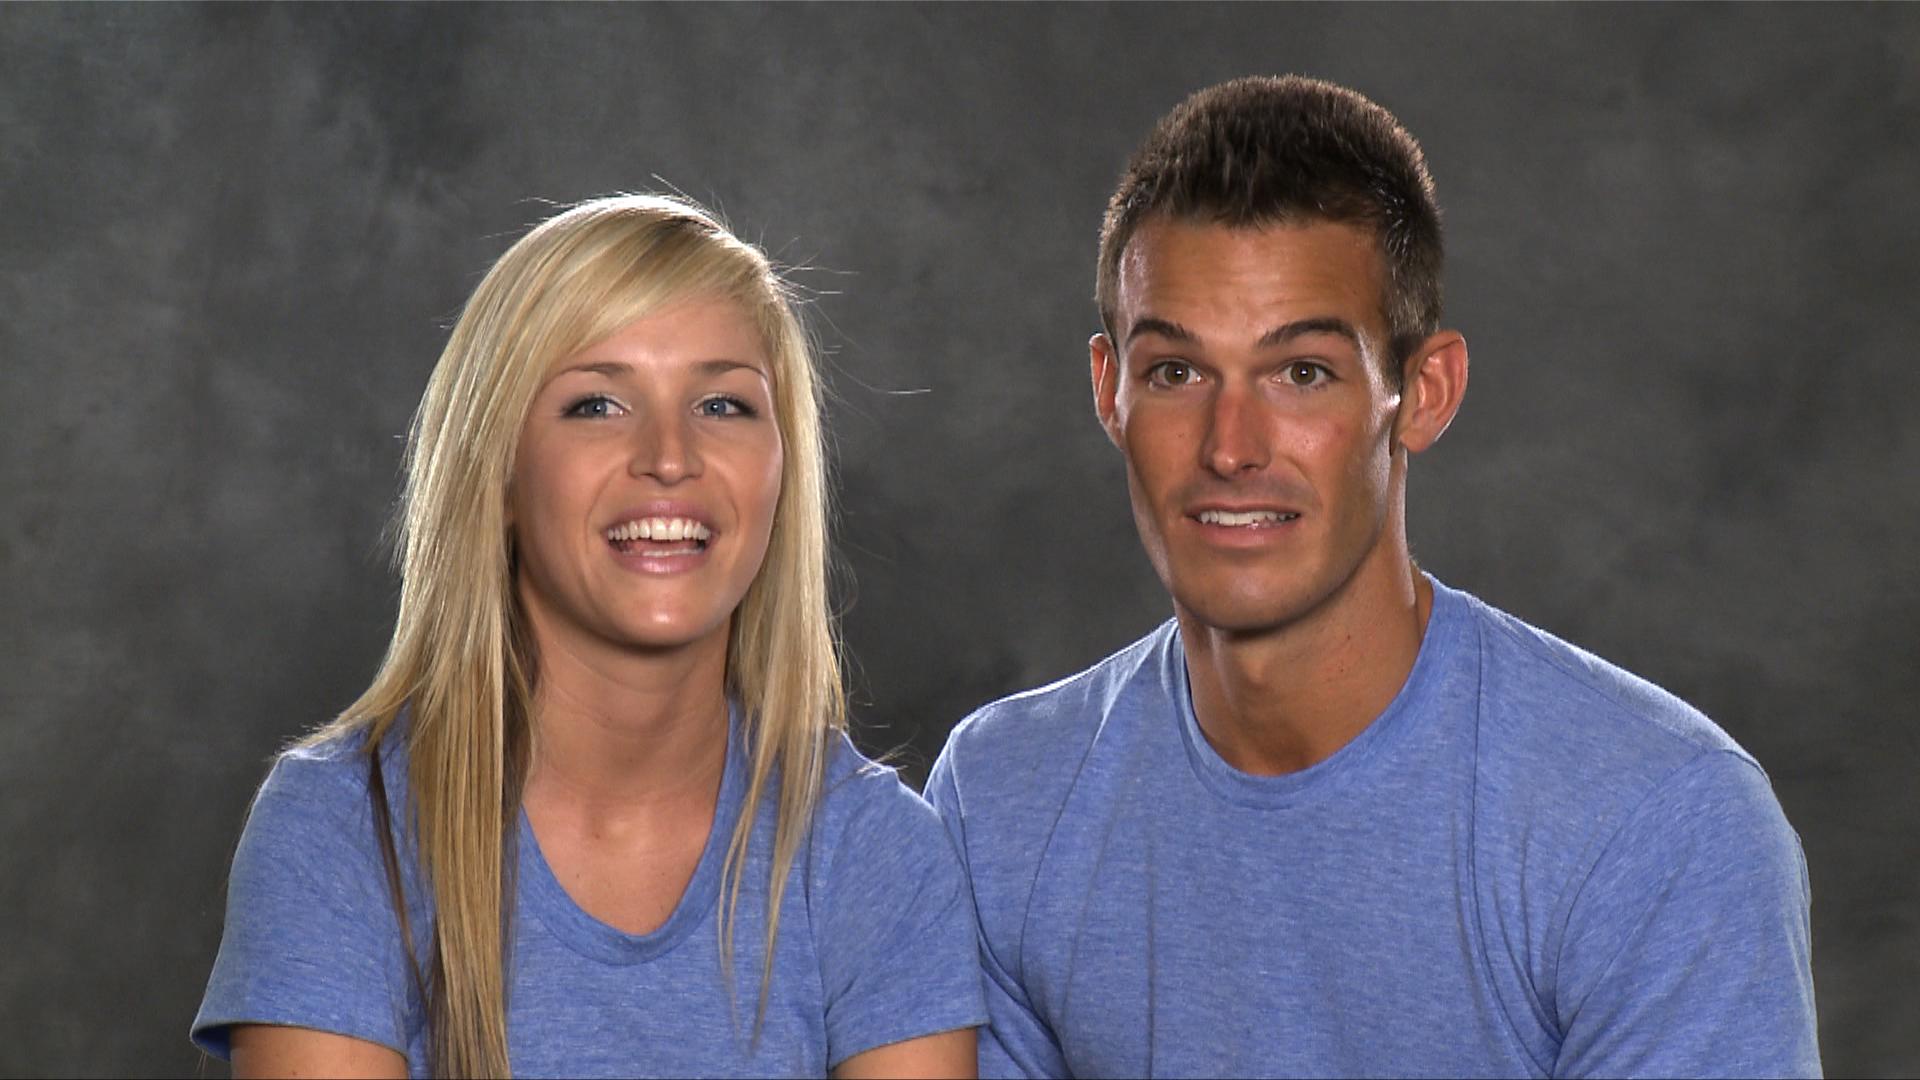 Meet Amanda and Kris, contestants on The Amazing Race 14